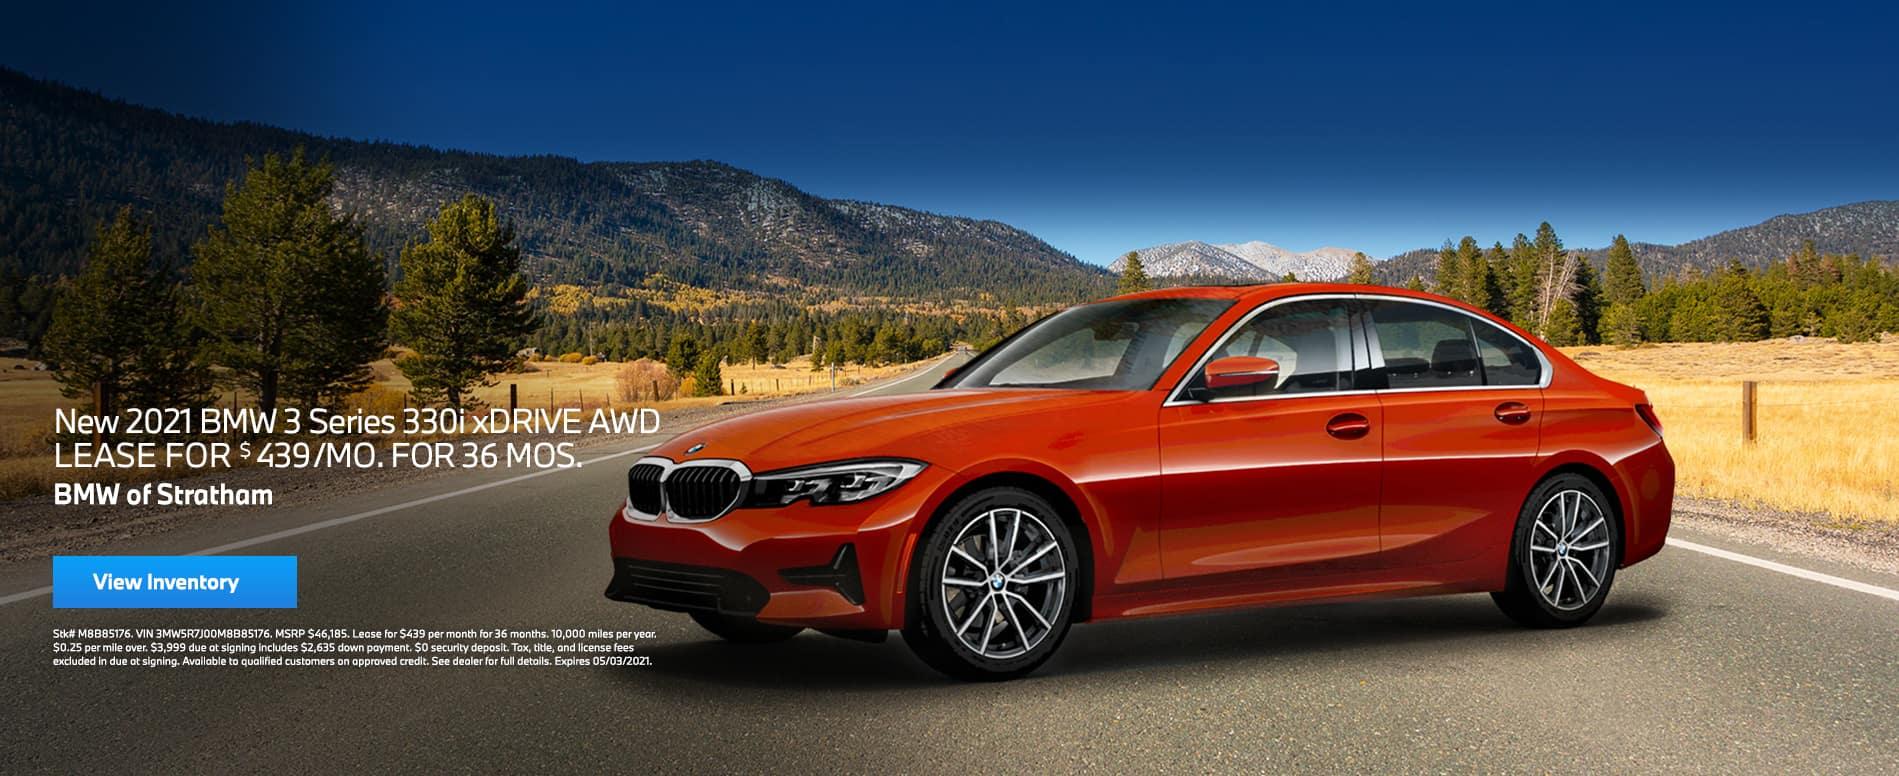 BMWStratham_Slide_1990x776_330i_4-2021